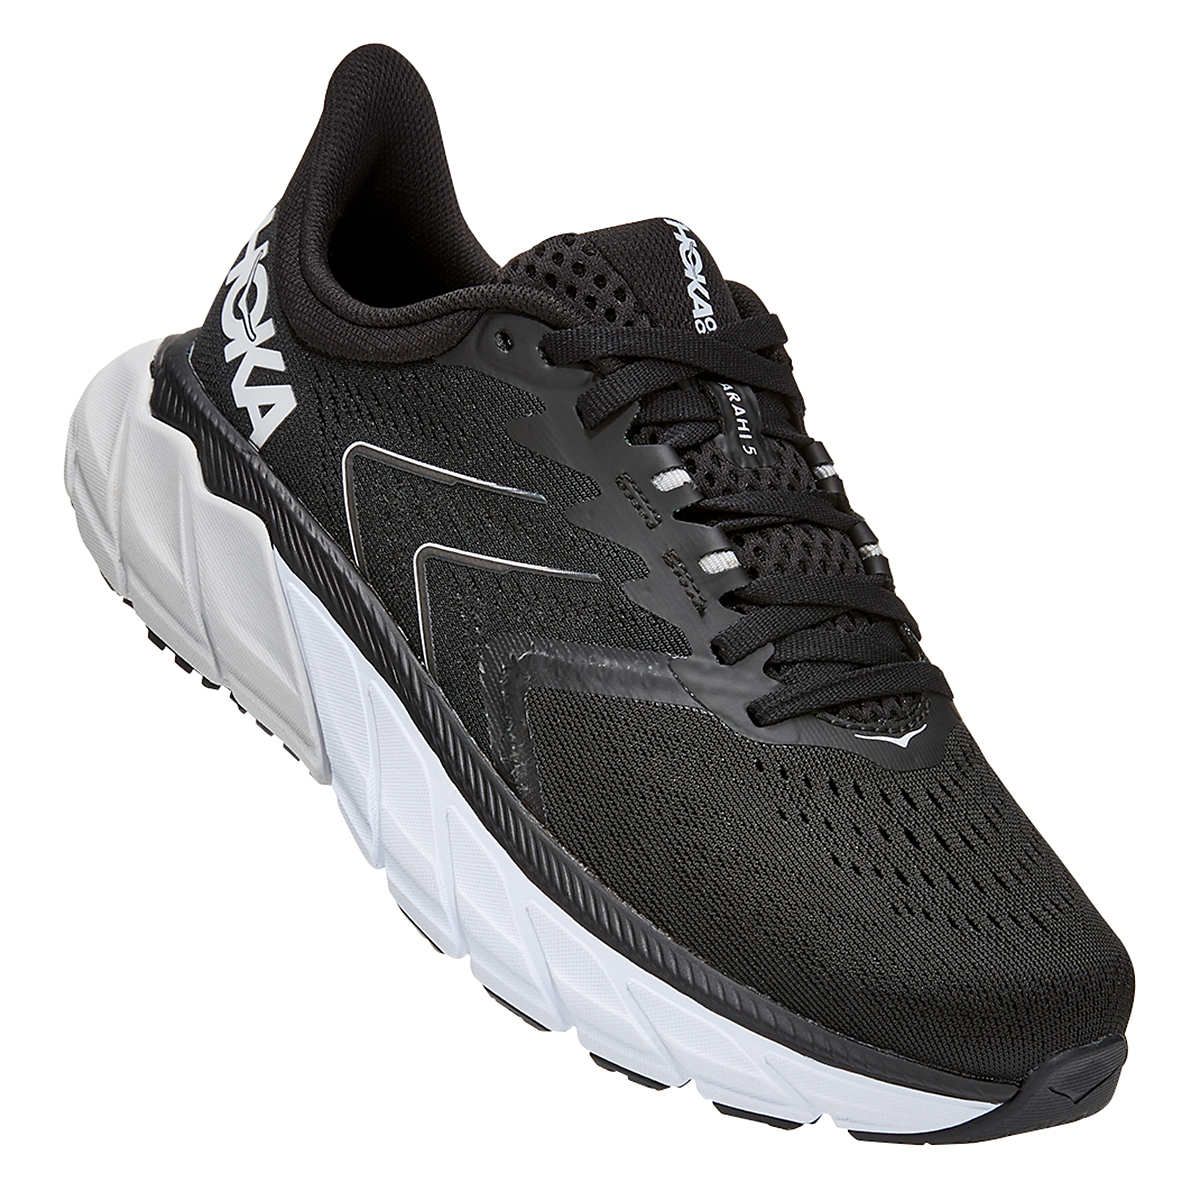 Women's Hoka One One Arahi 5 Running Shoe - Color: Black/White - Size: 5 - Width: Regular, Black/White, large, image 3